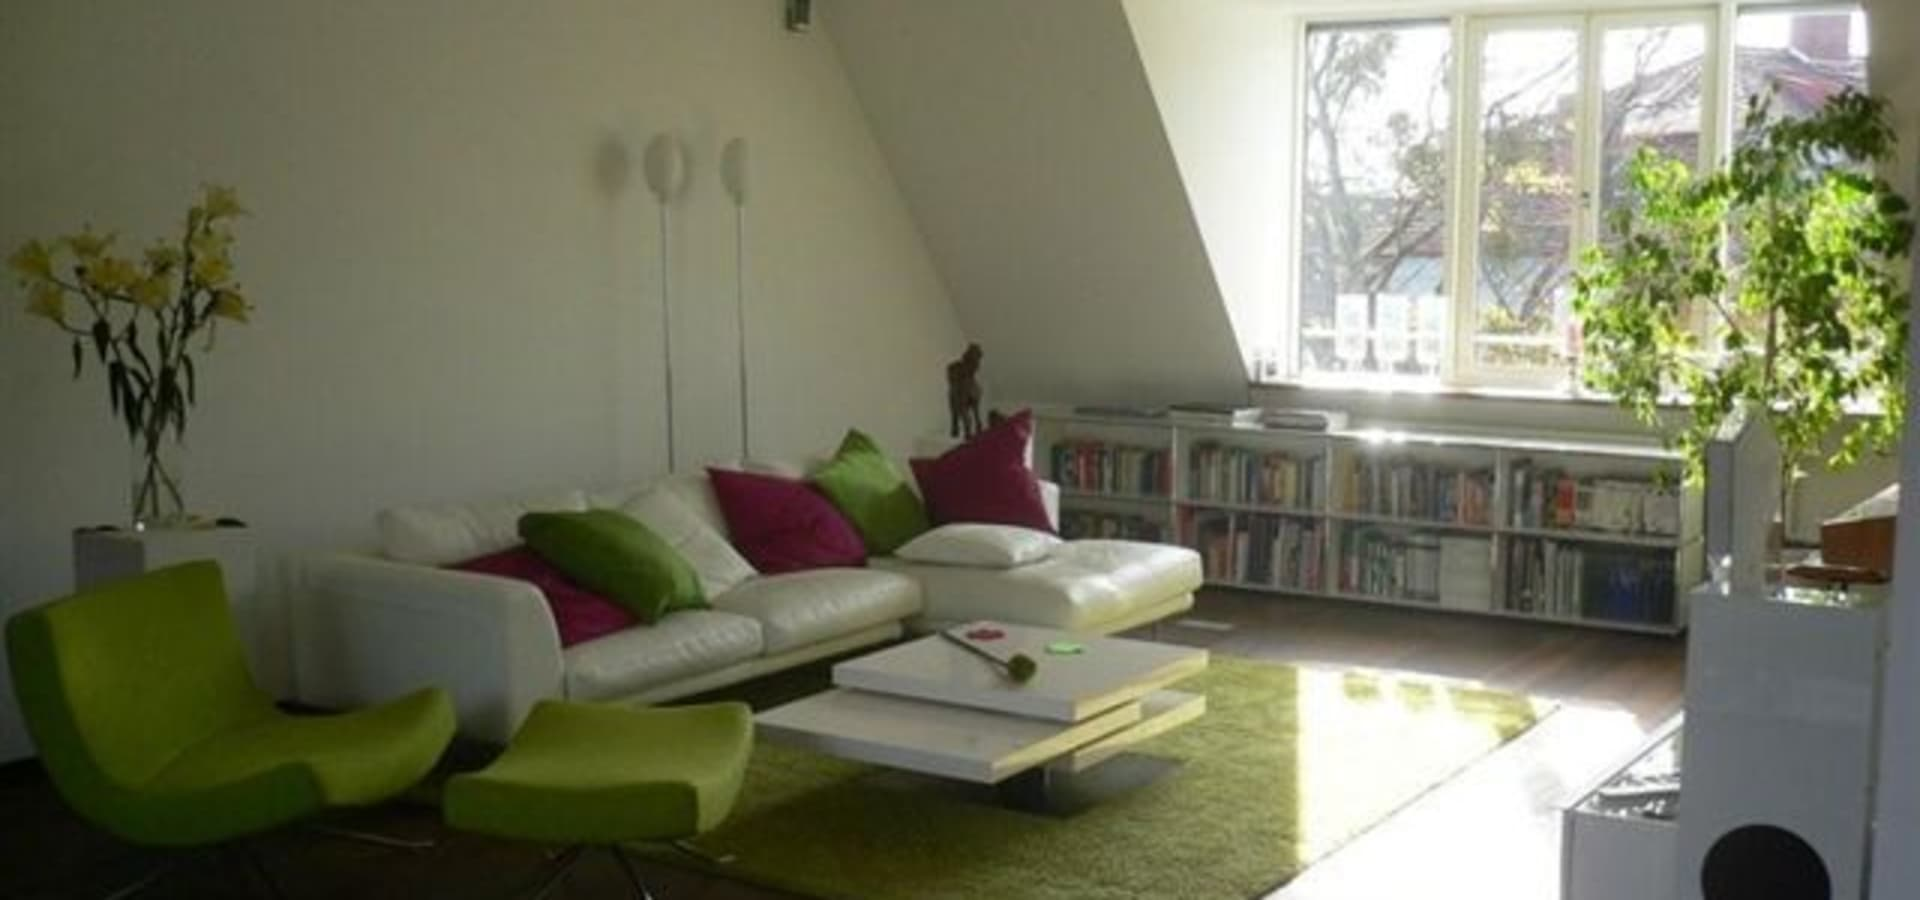 angelika gruber interior design